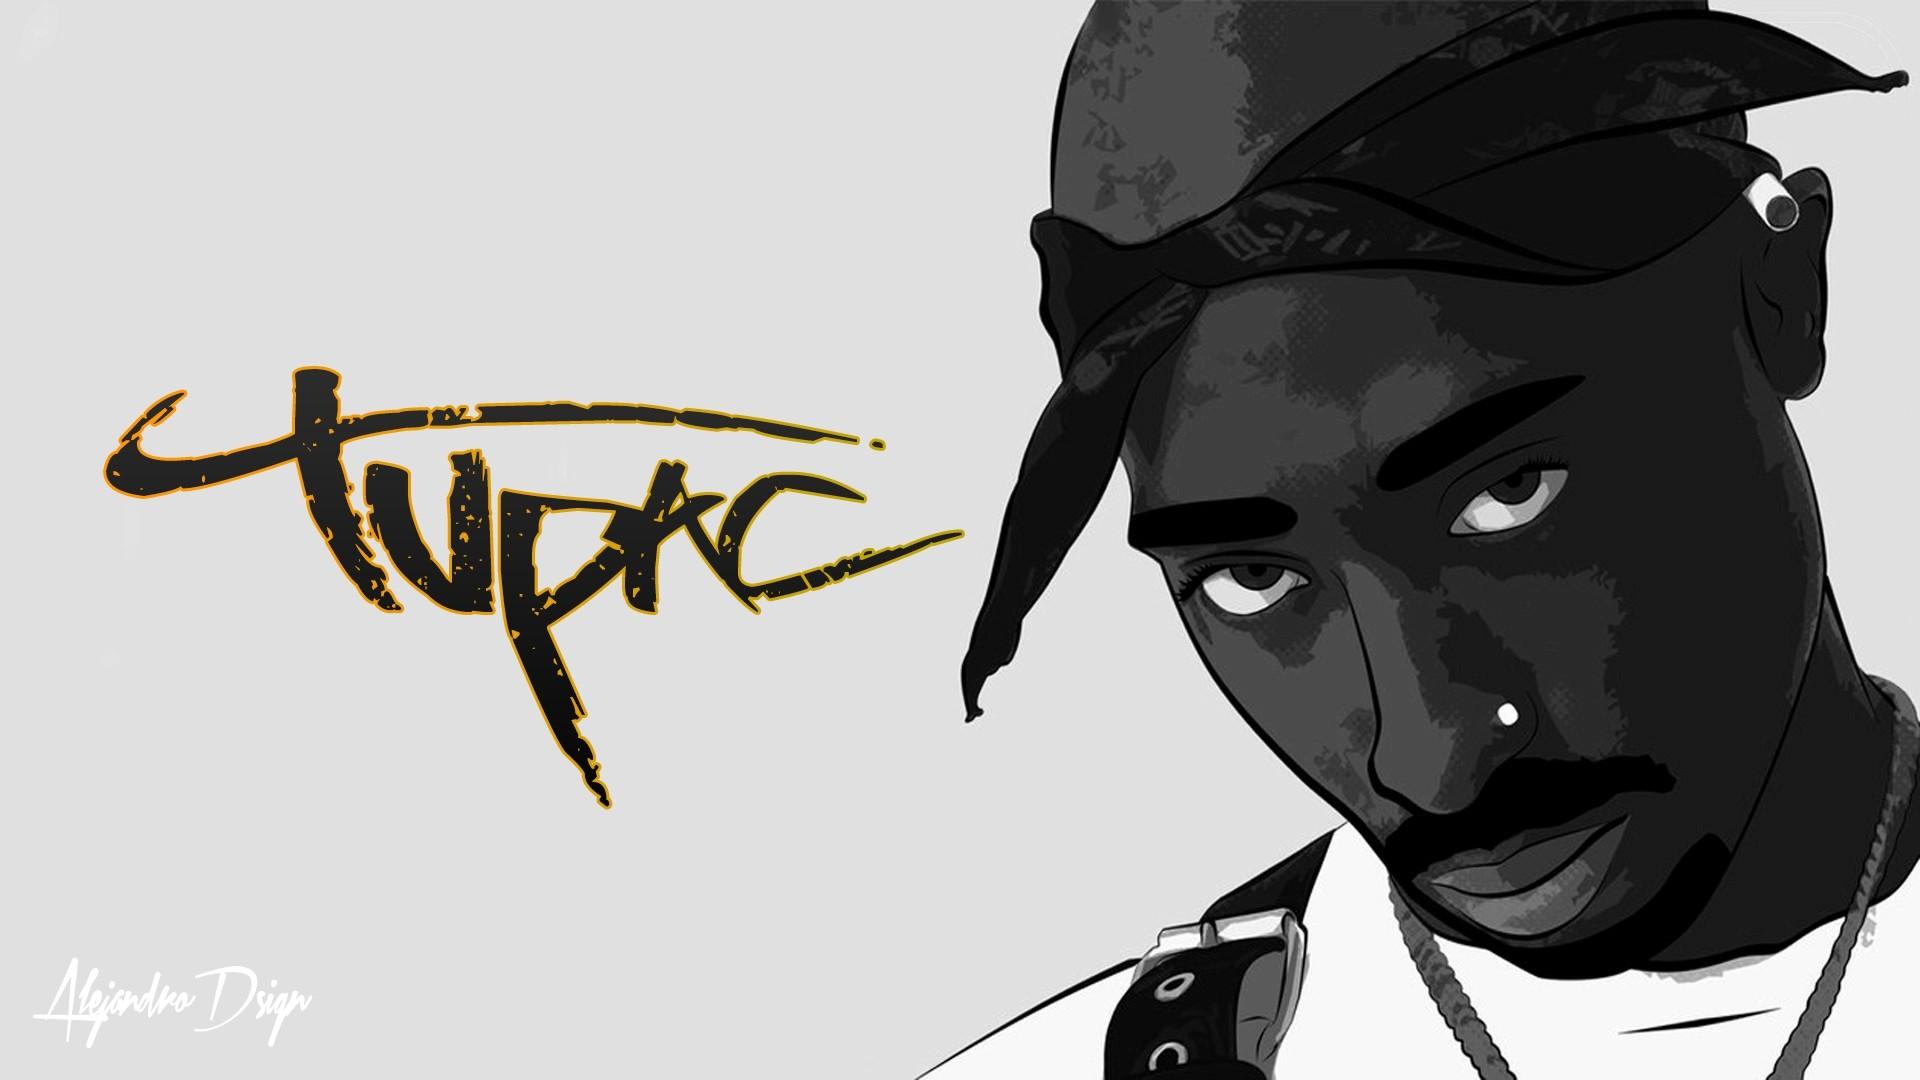 drawing illustration hip hop cartoon 2Pac Makaveli ART sketch 1920x1080 px font